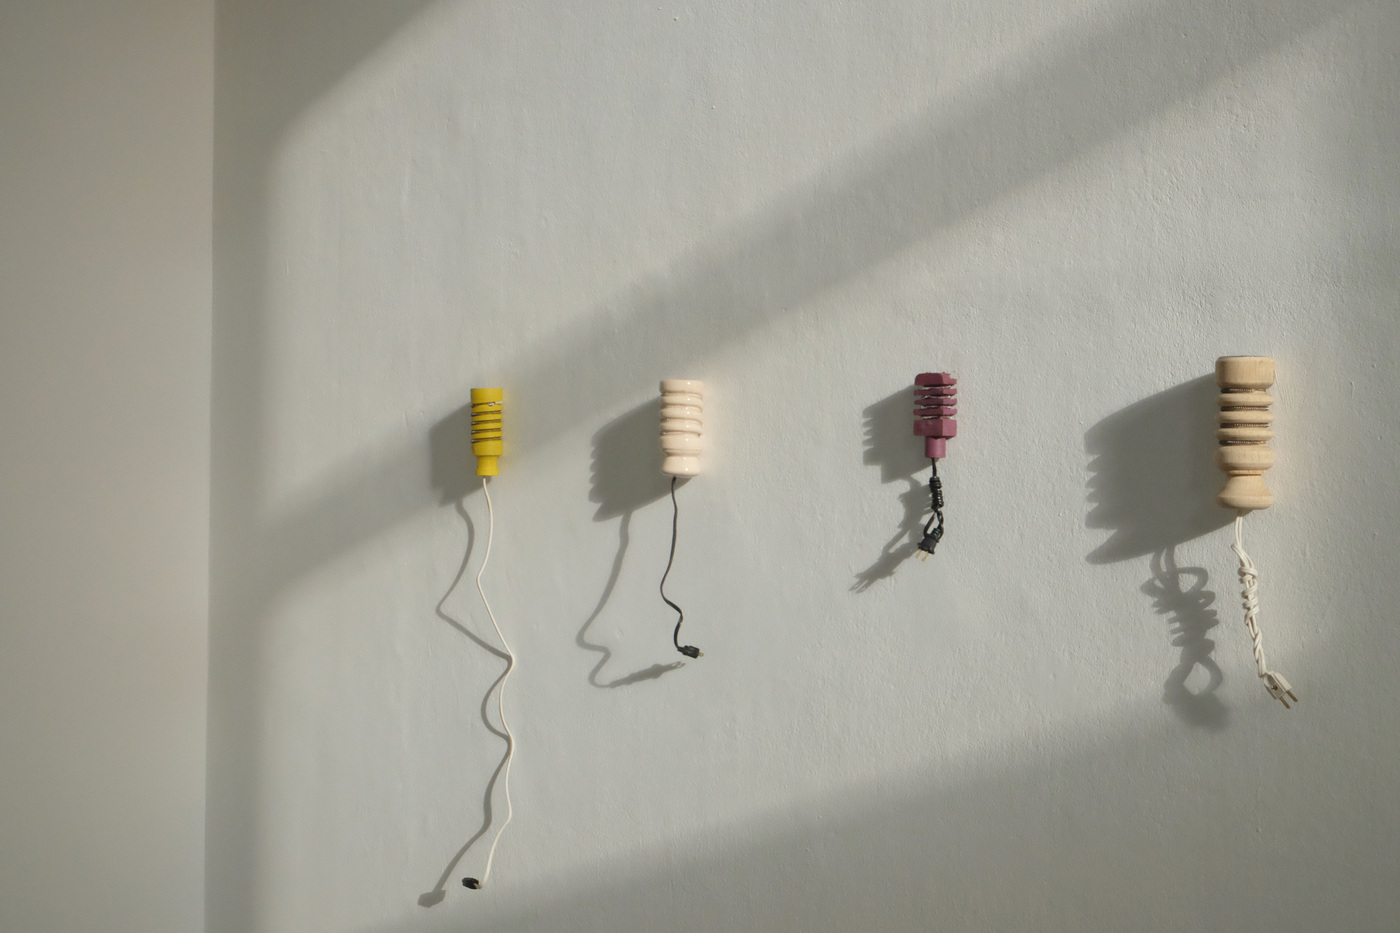 Manuela Moscoso, no titel, Exhibition view of Darius Mikšys, Hayward & Tamayo, Kunstverein München 2016 © Kunstverein München e.V._23